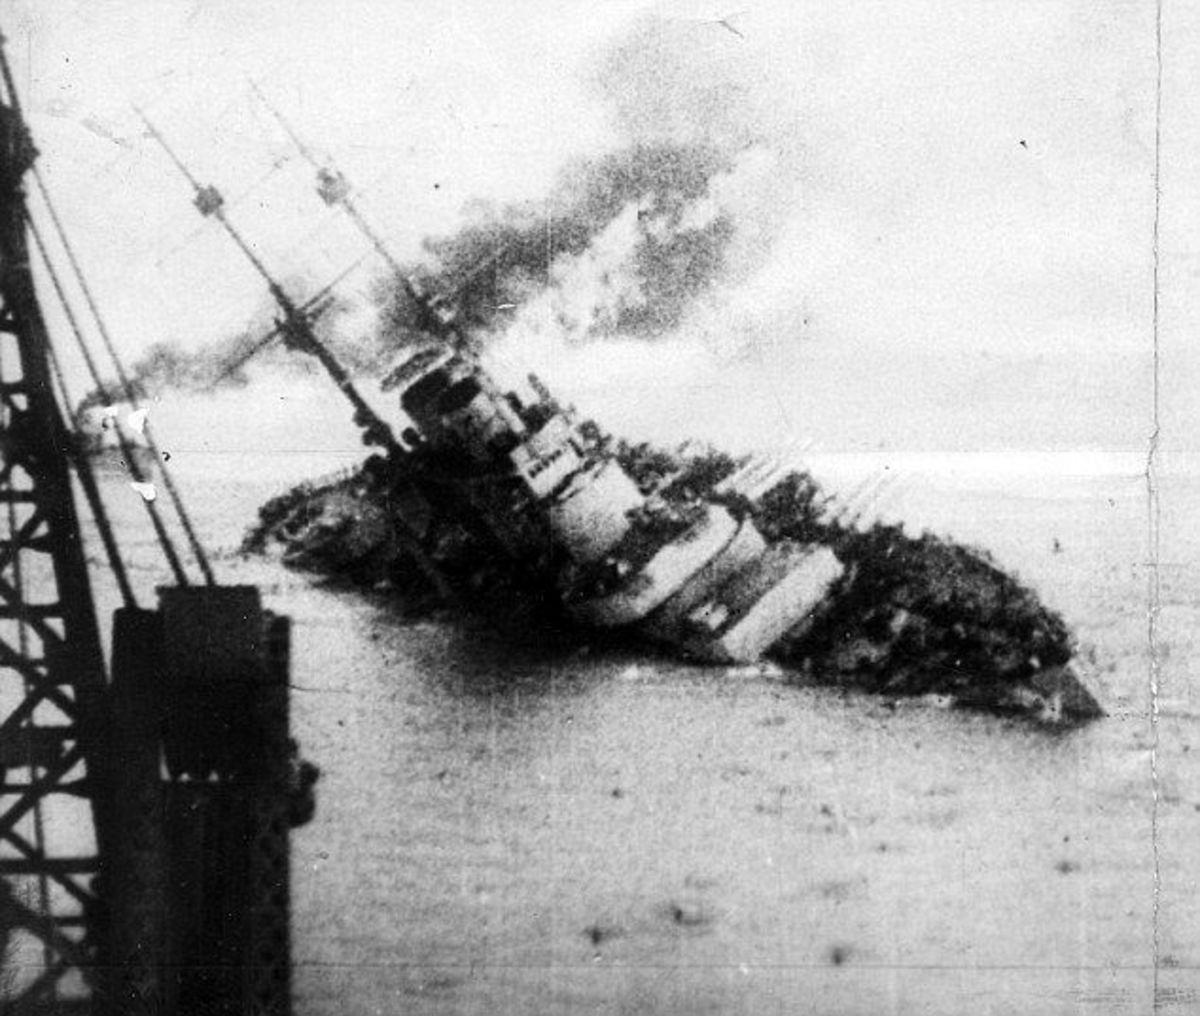 battle-of-jutland-biggest-ever-battle-involving-surface-ships1916